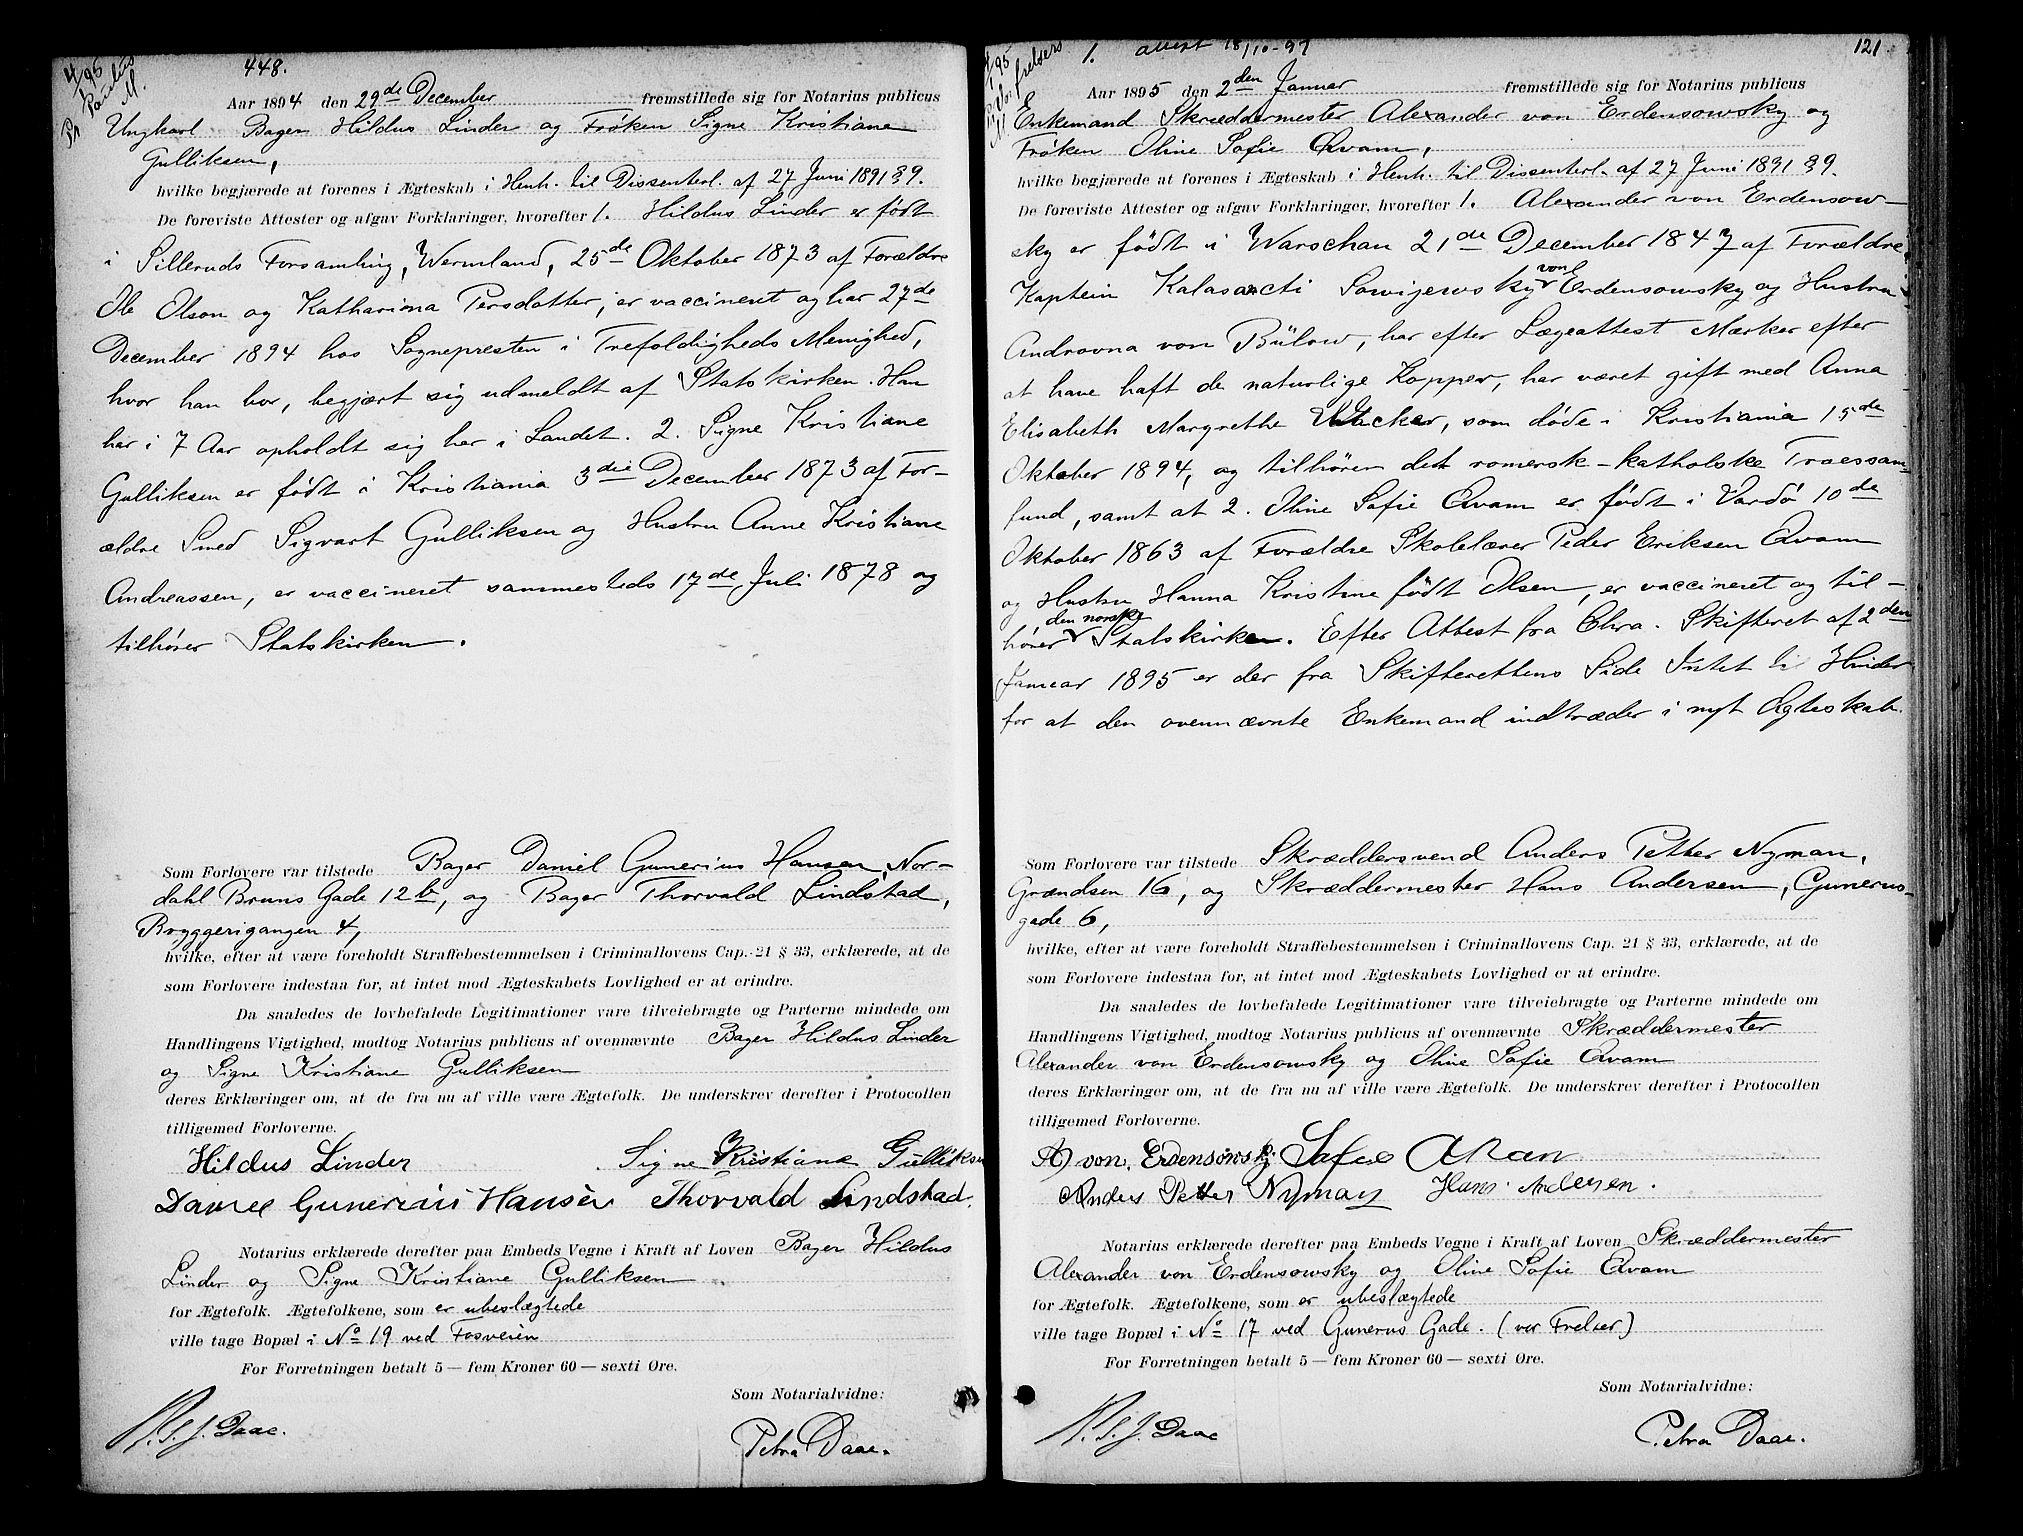 SAO, Oslo byfogd avd. I, L/Lb/Lbb/L0002: Notarialprotokoll, rekke II: Vigsler, 1893-1897, s. 120b-121a